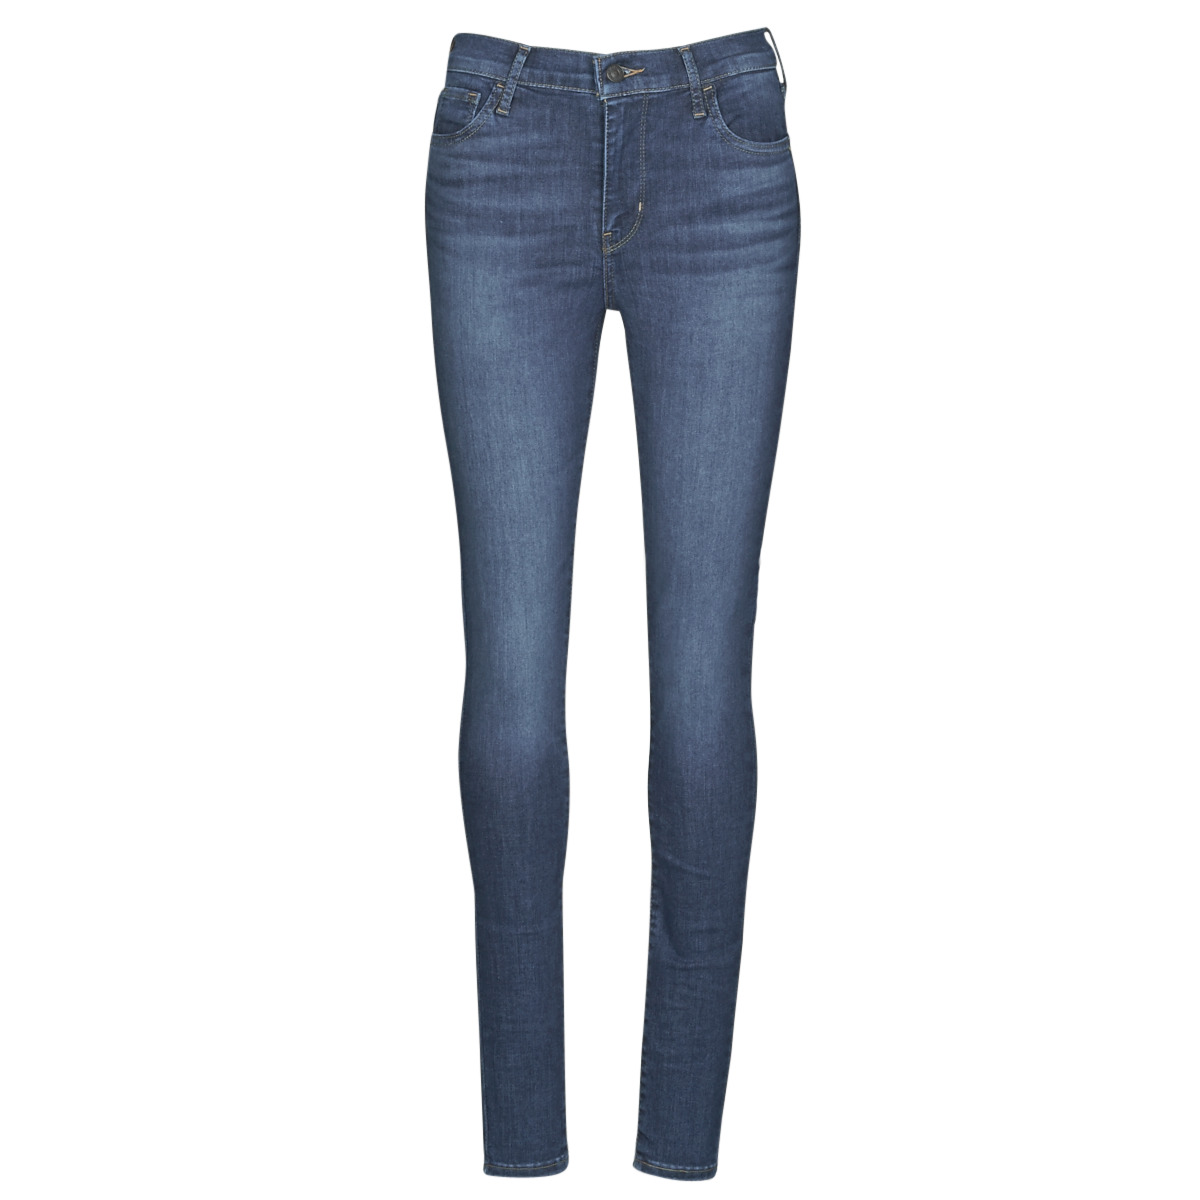 Jeans - skinny Levis  720 HIRISE SUPER SKINNY